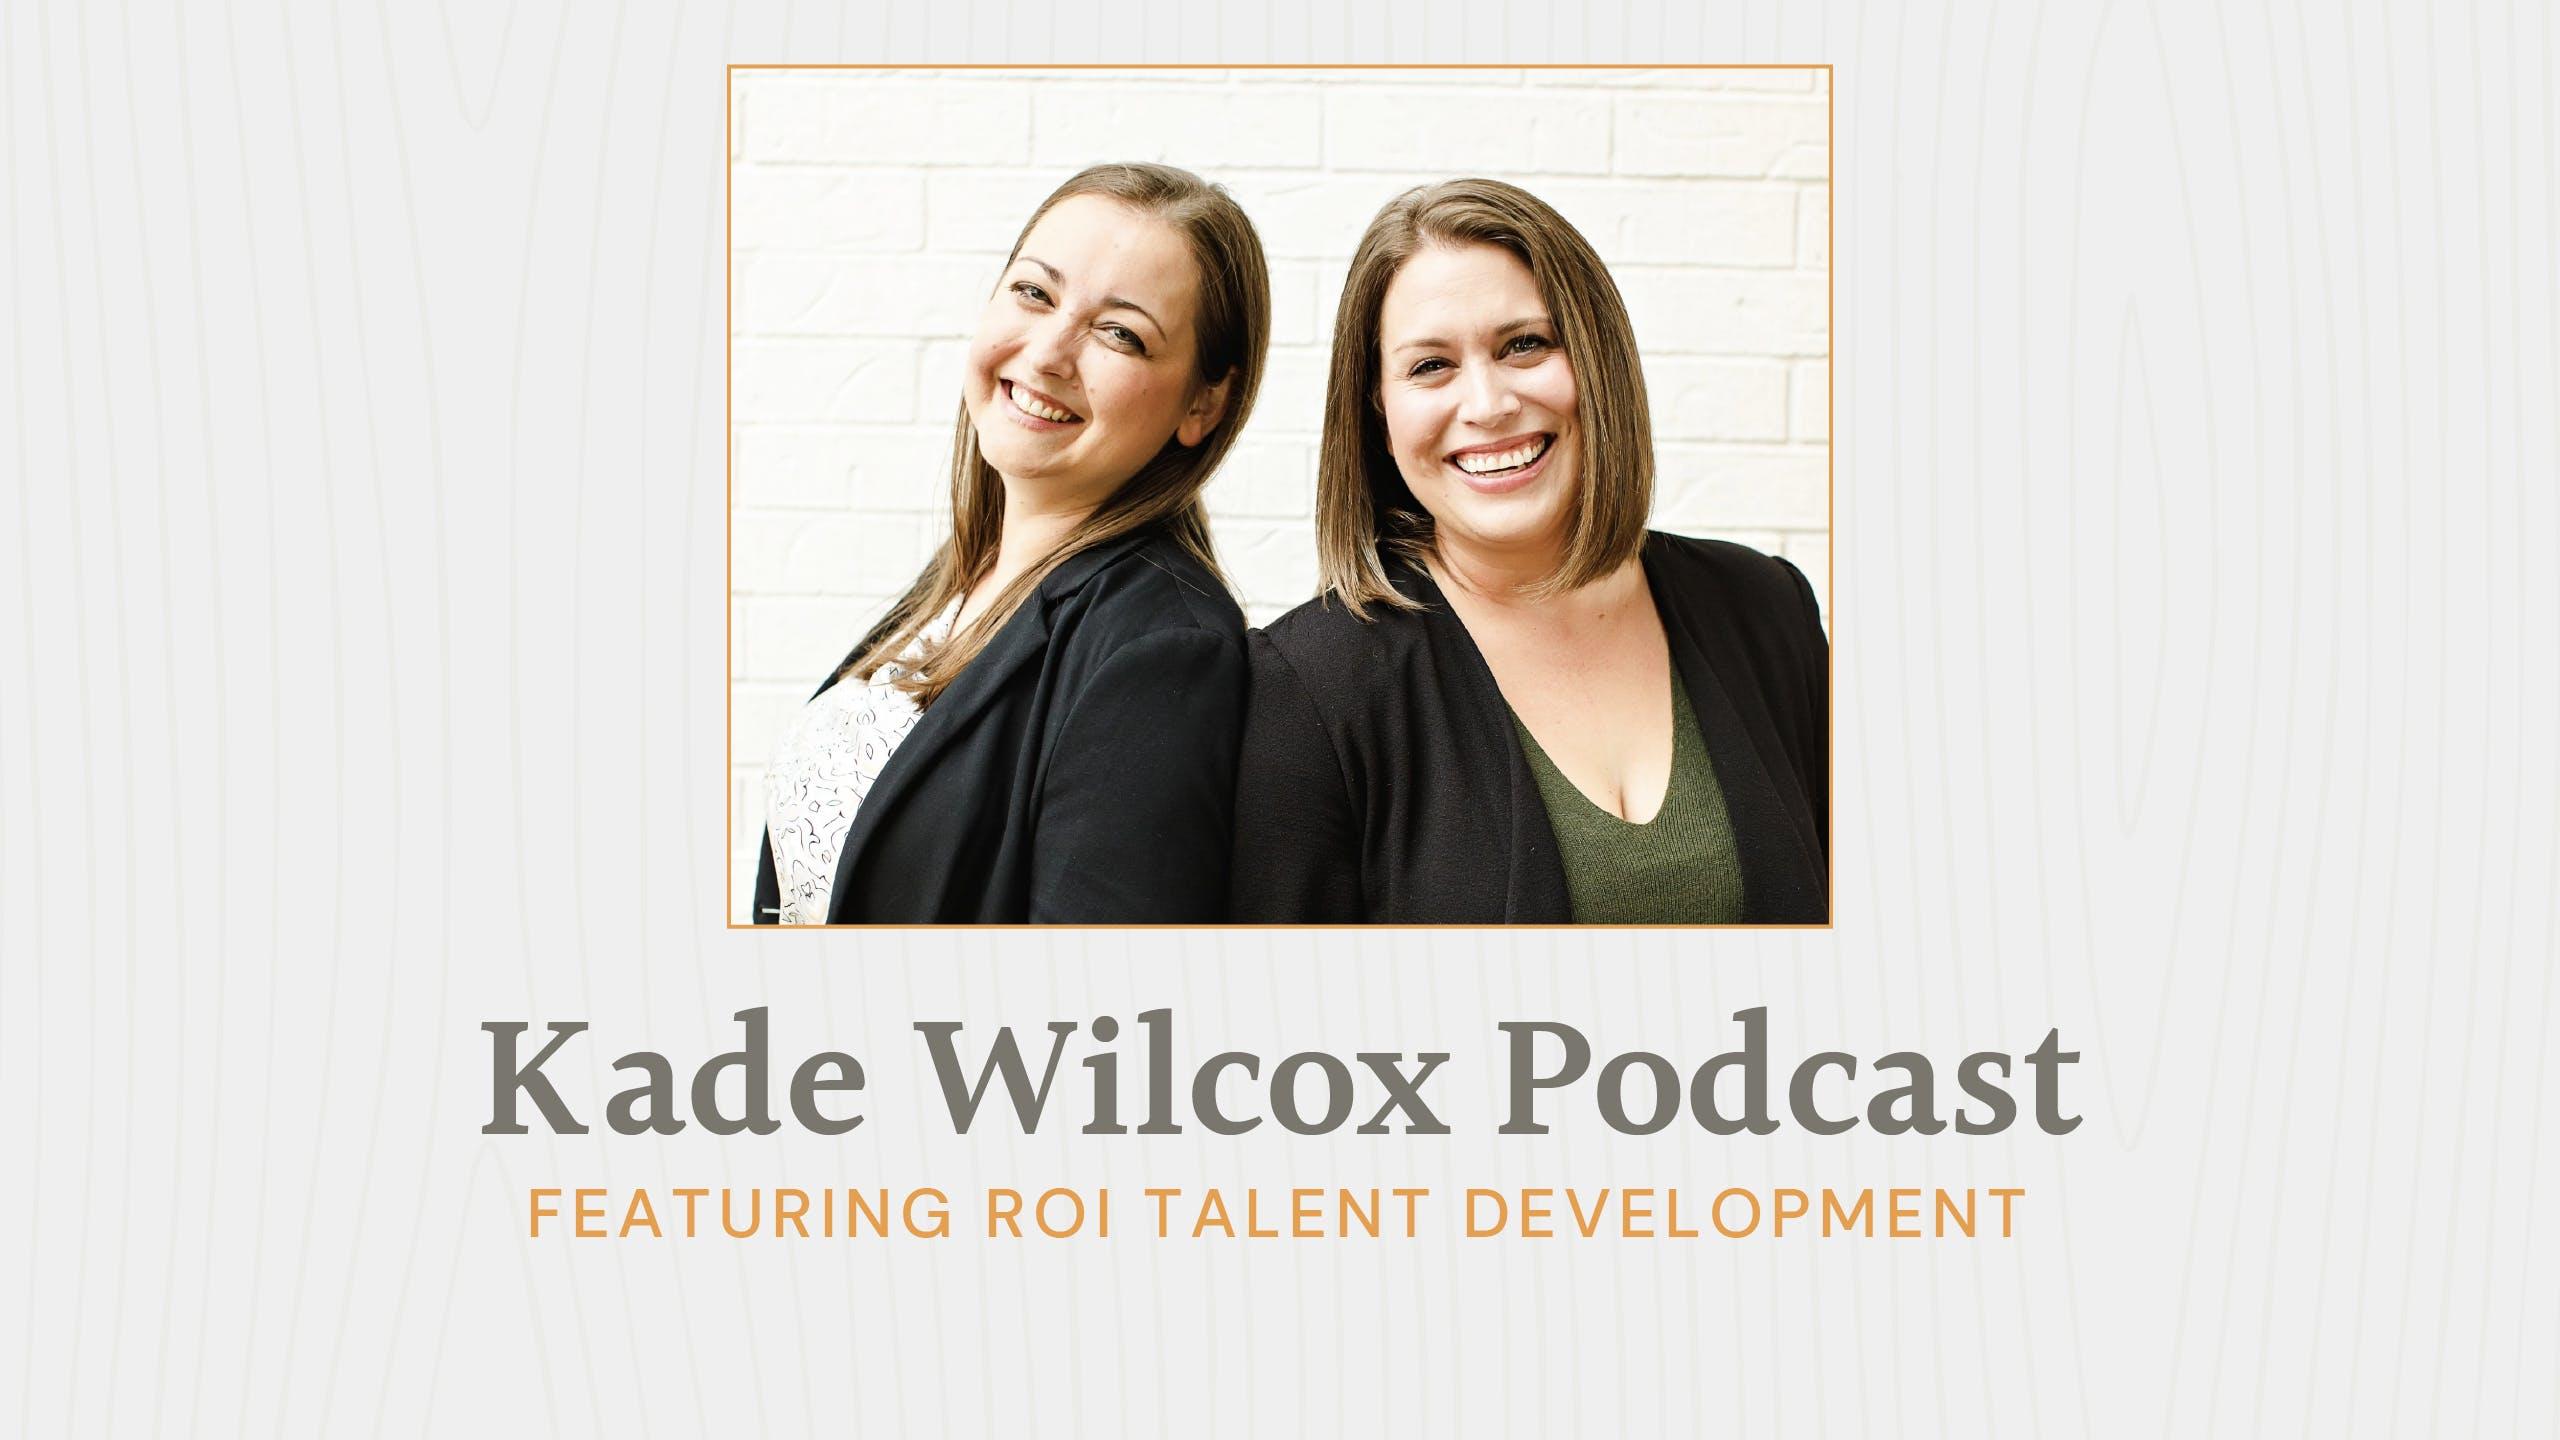 The Kade Wilcox Podcast: ROI Talent Development image